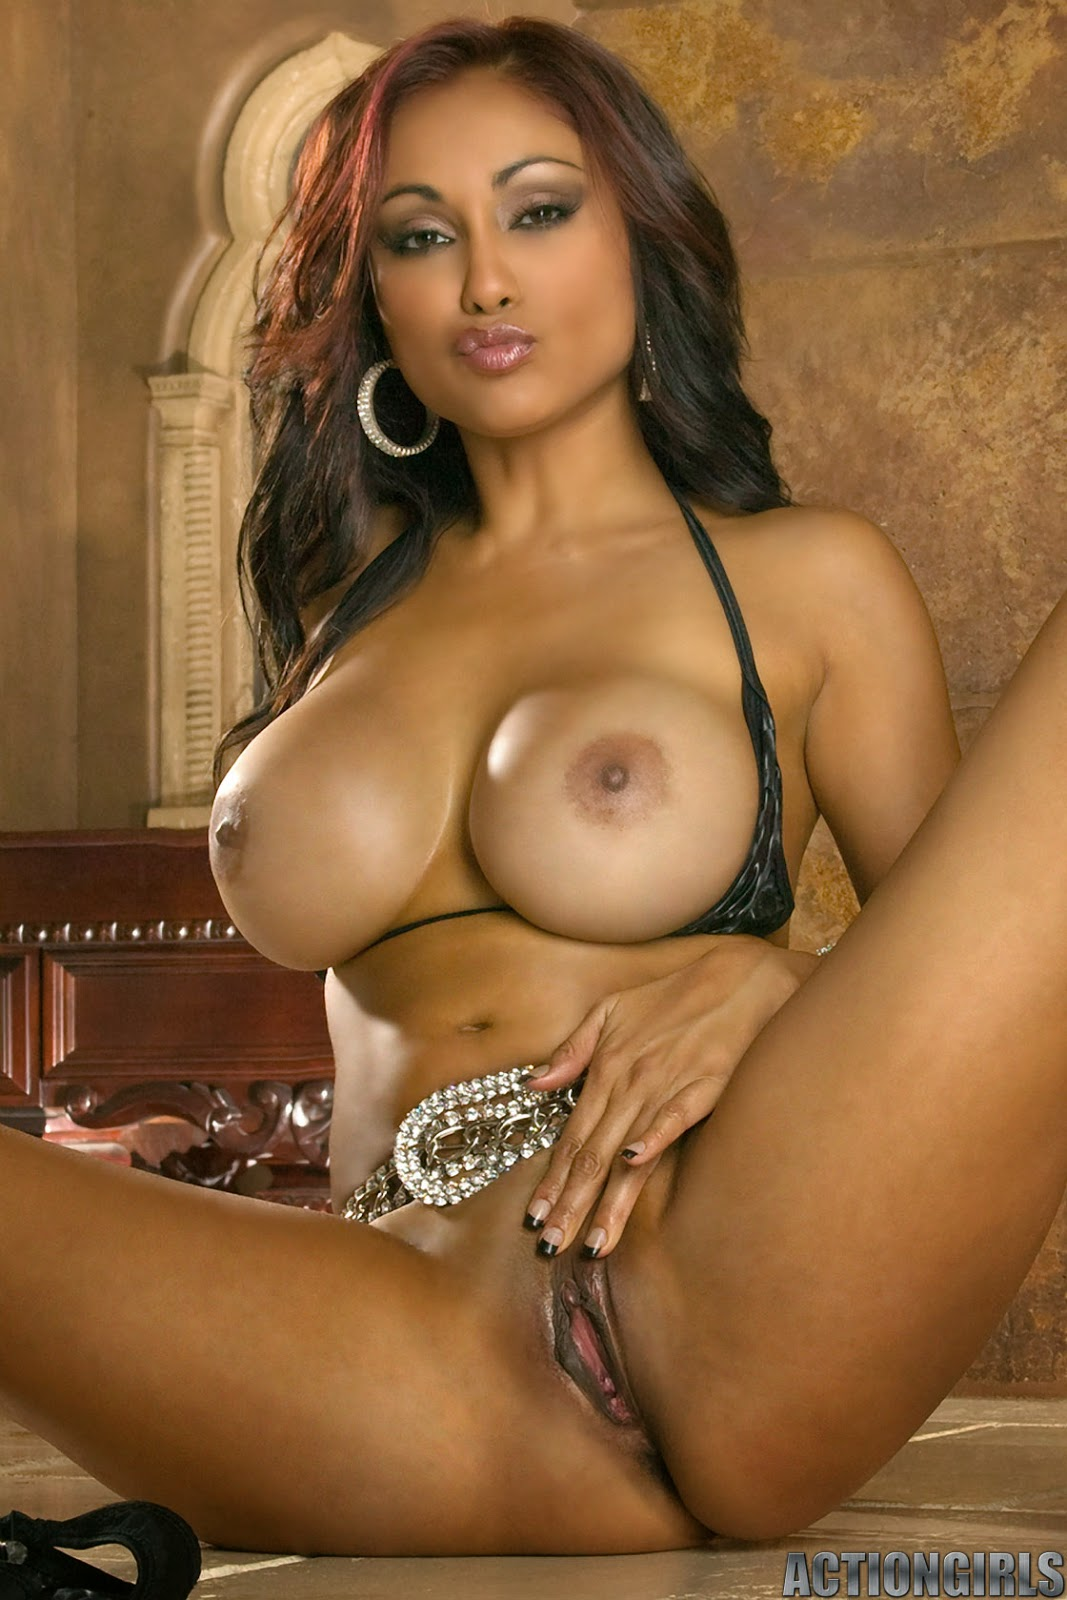 Nude pics of ashley graham-1072